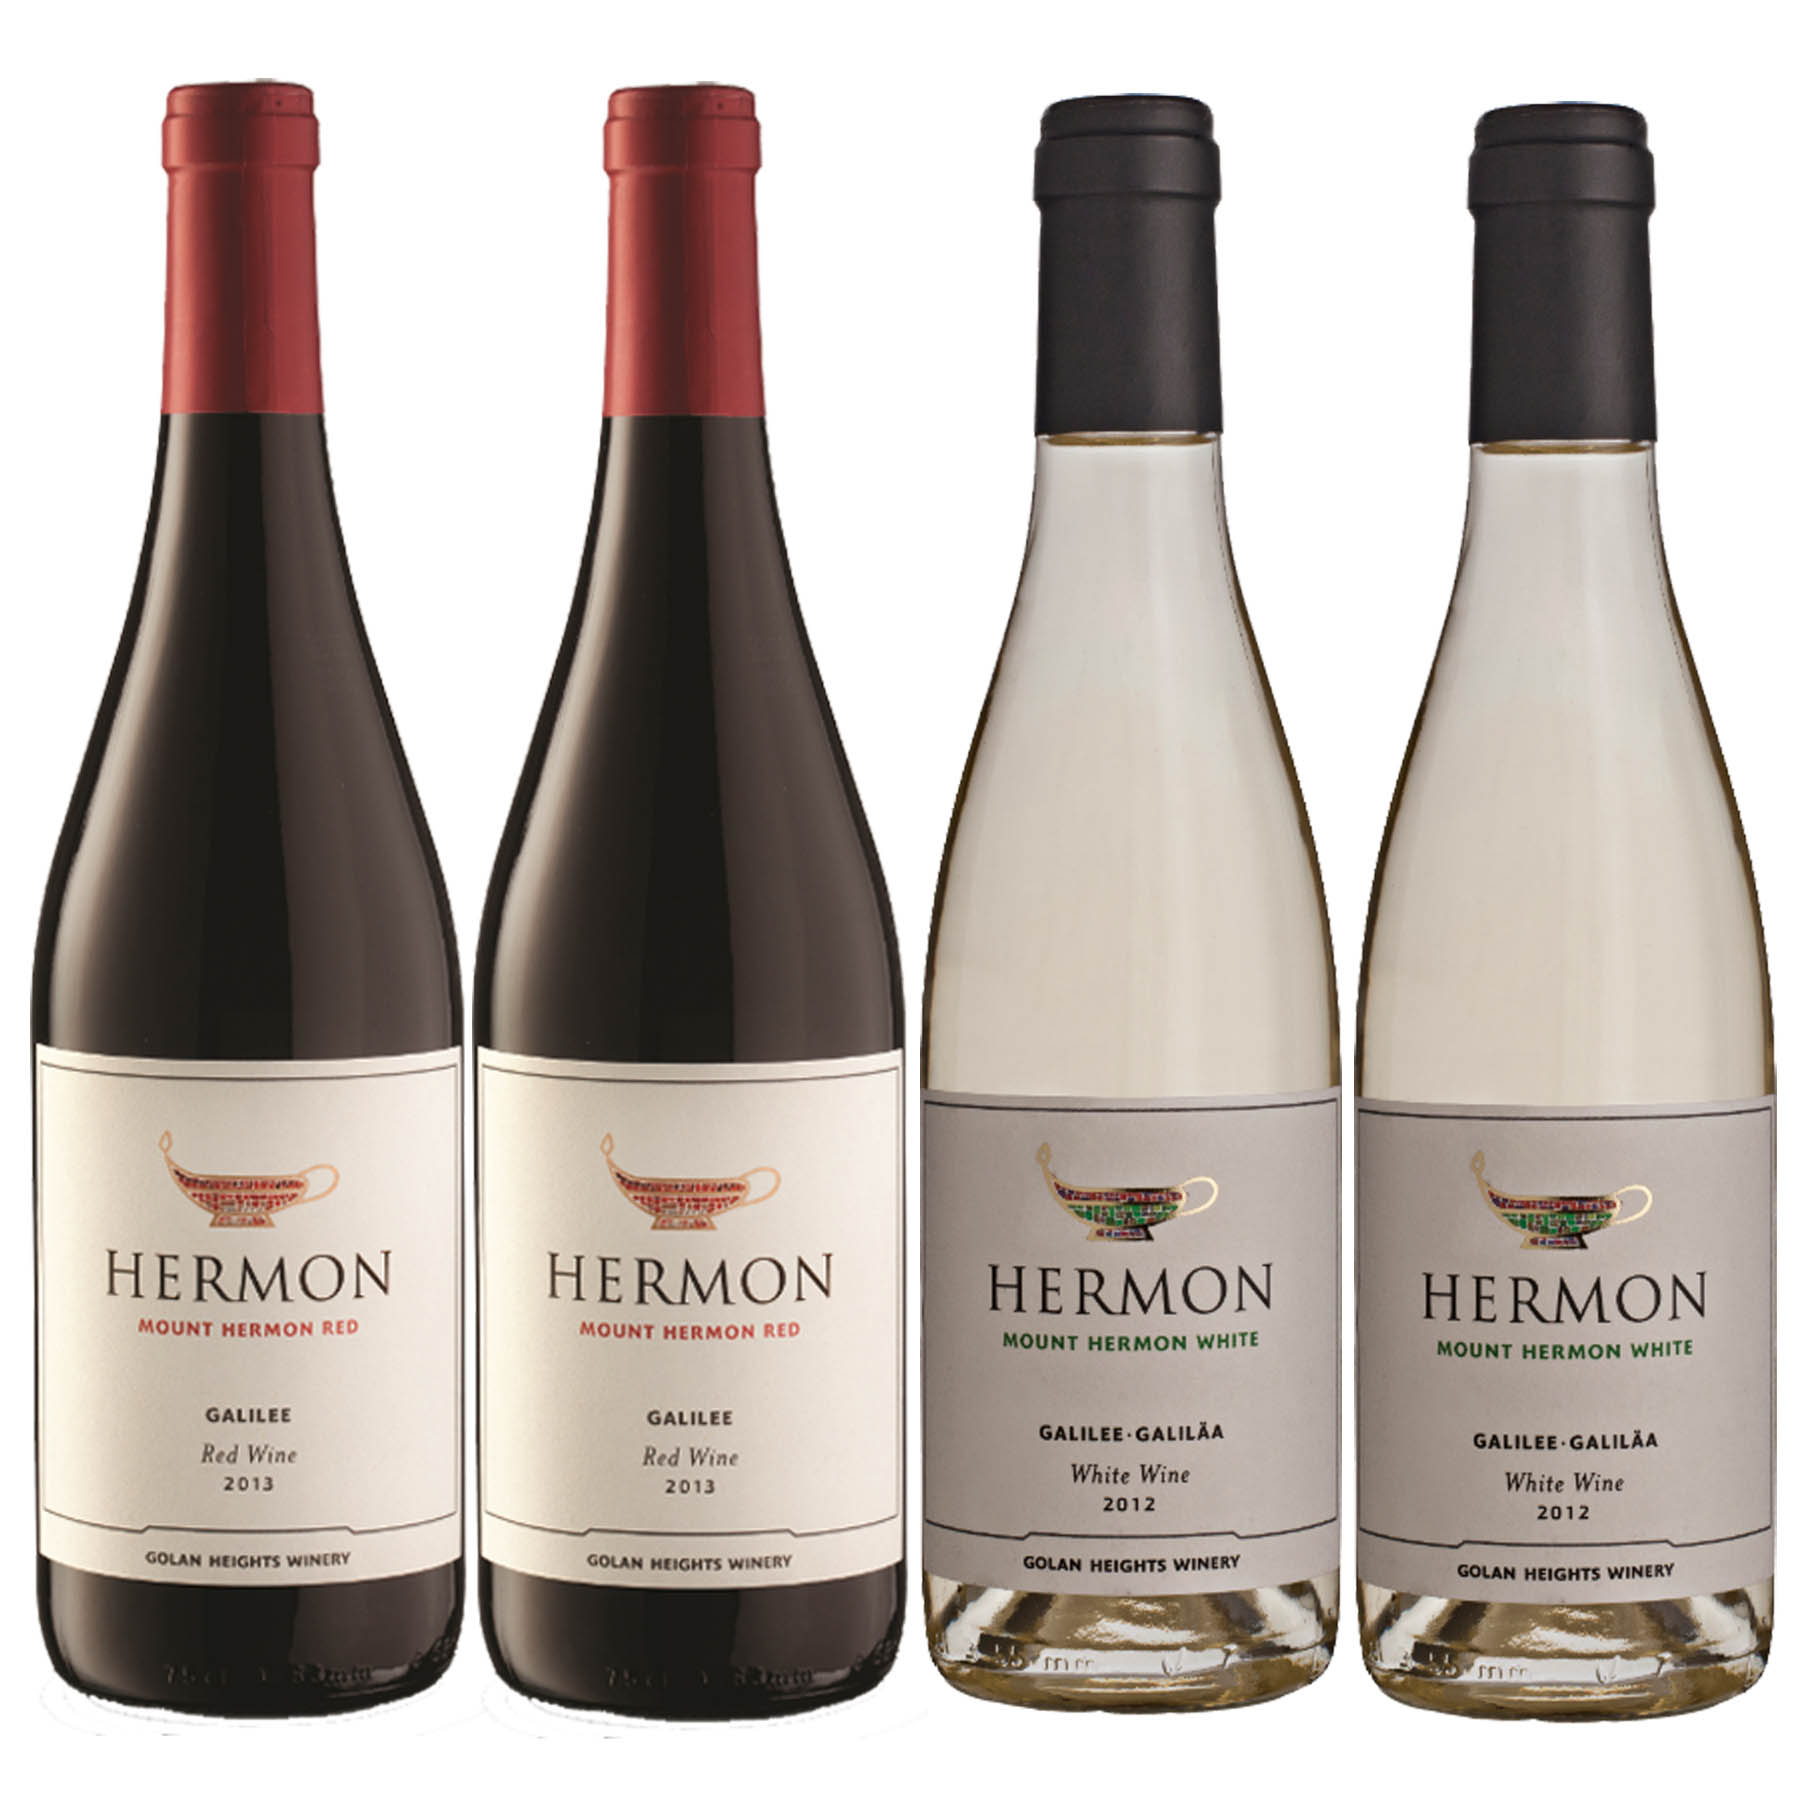 Kit 4 Vinho Branco/Tinto Israelense Kosher Hermon Yarden Golan Heights 2018